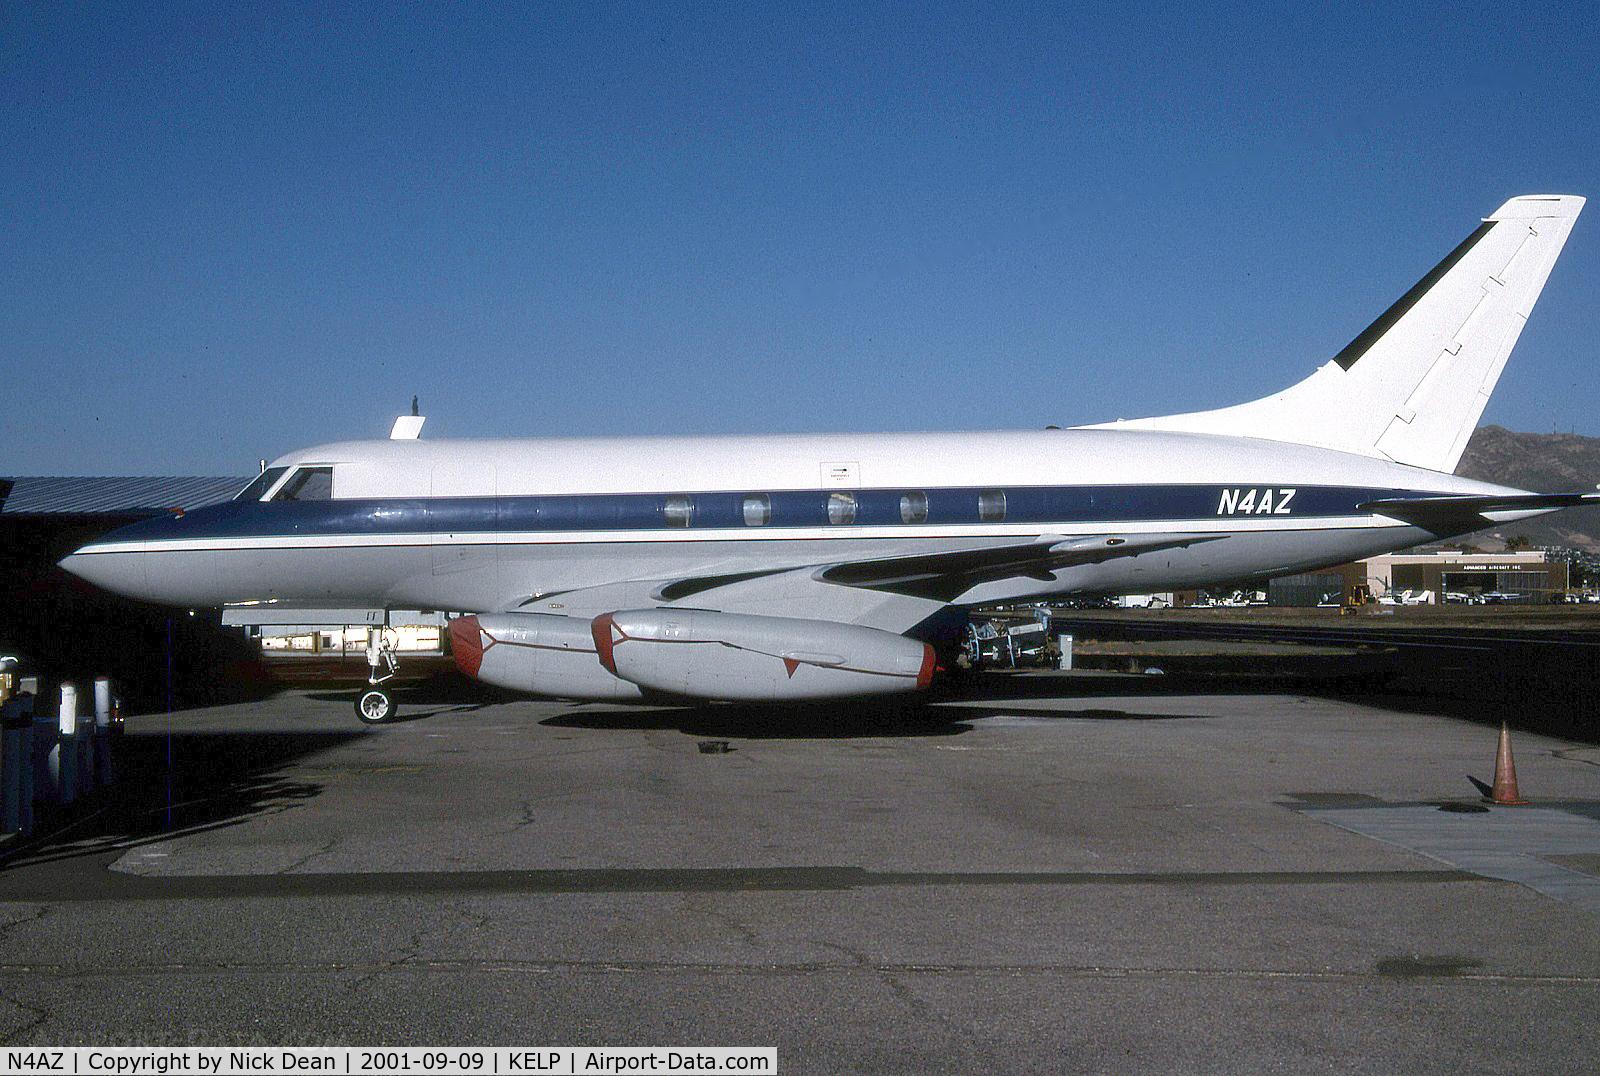 N4AZ, McDonnell Douglas 220 C/N 1, KELP